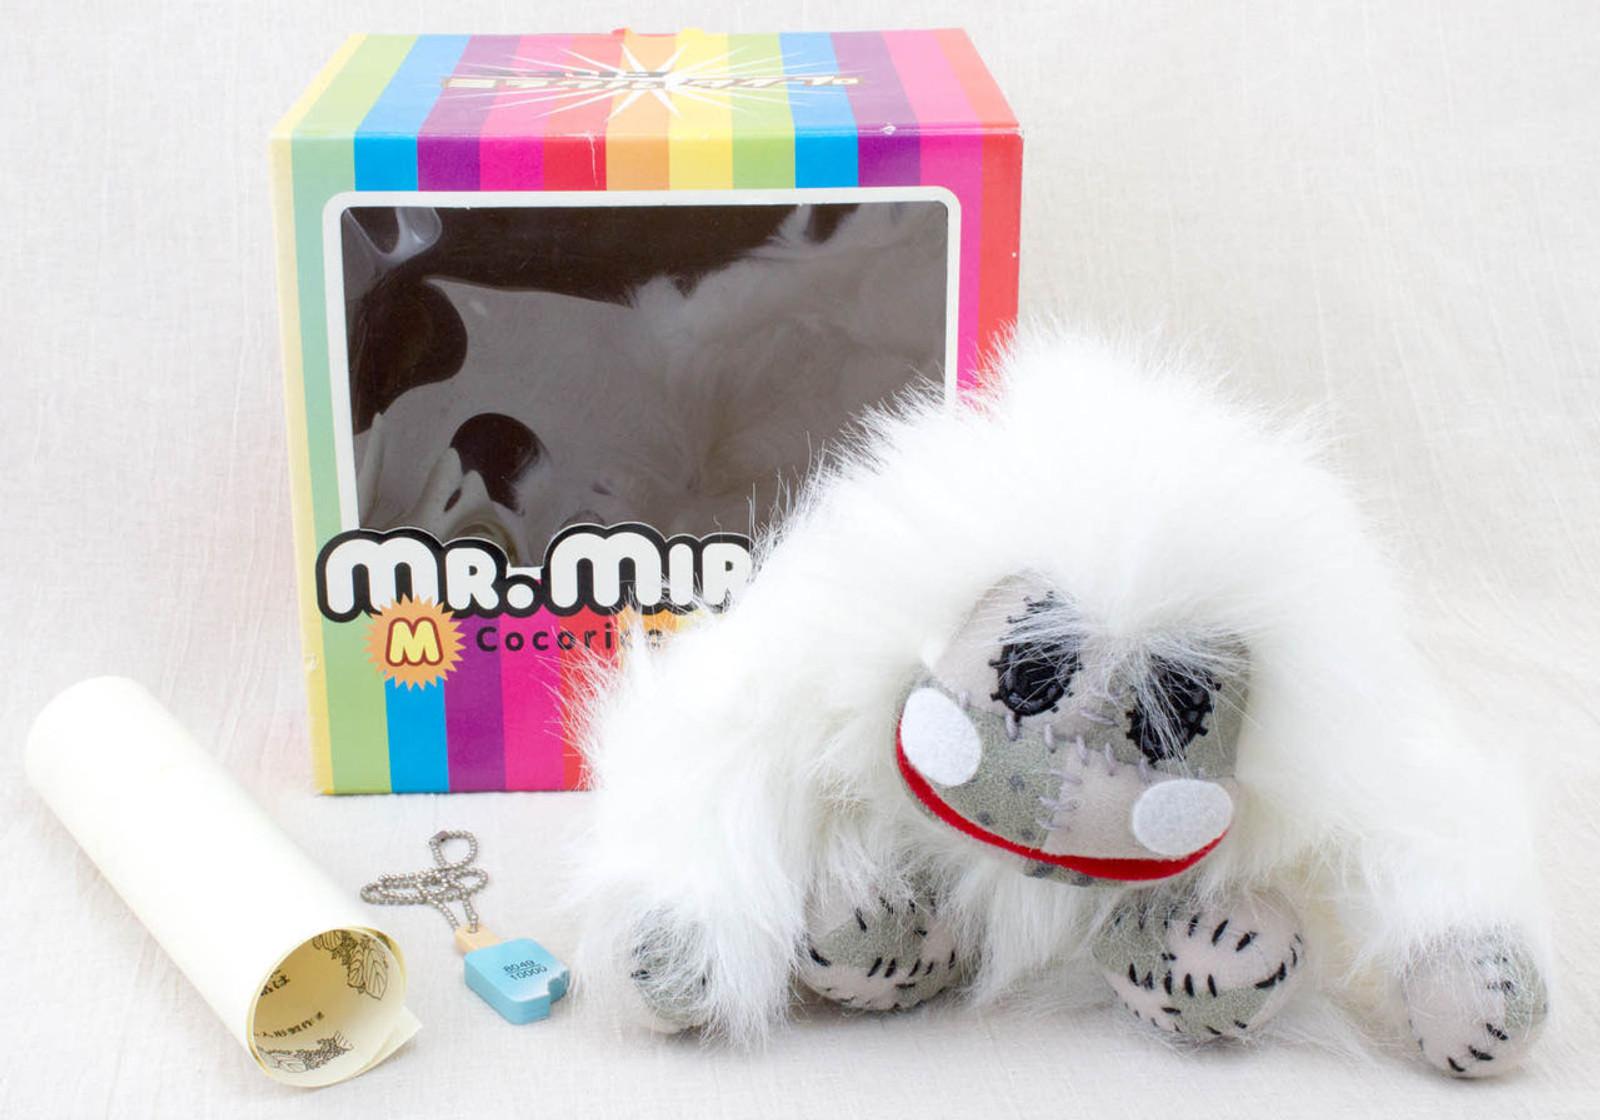 Cocorico Miracle Type MR. MIRACLE Plush Doll 2003 ver. JAPAN TV White gorila